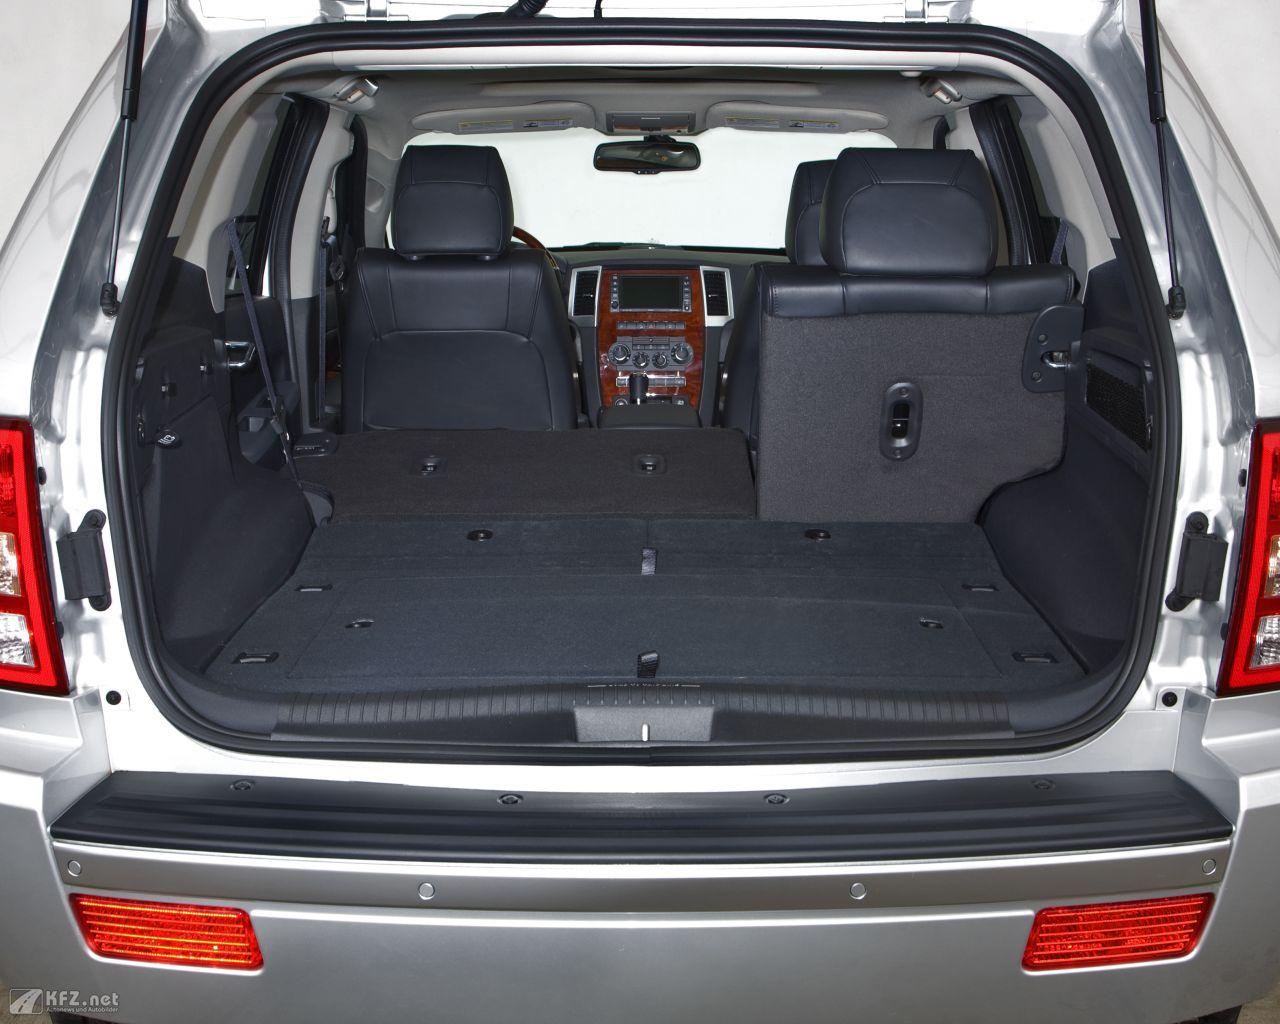 jeep-grand-cherokee-1280x1024-15